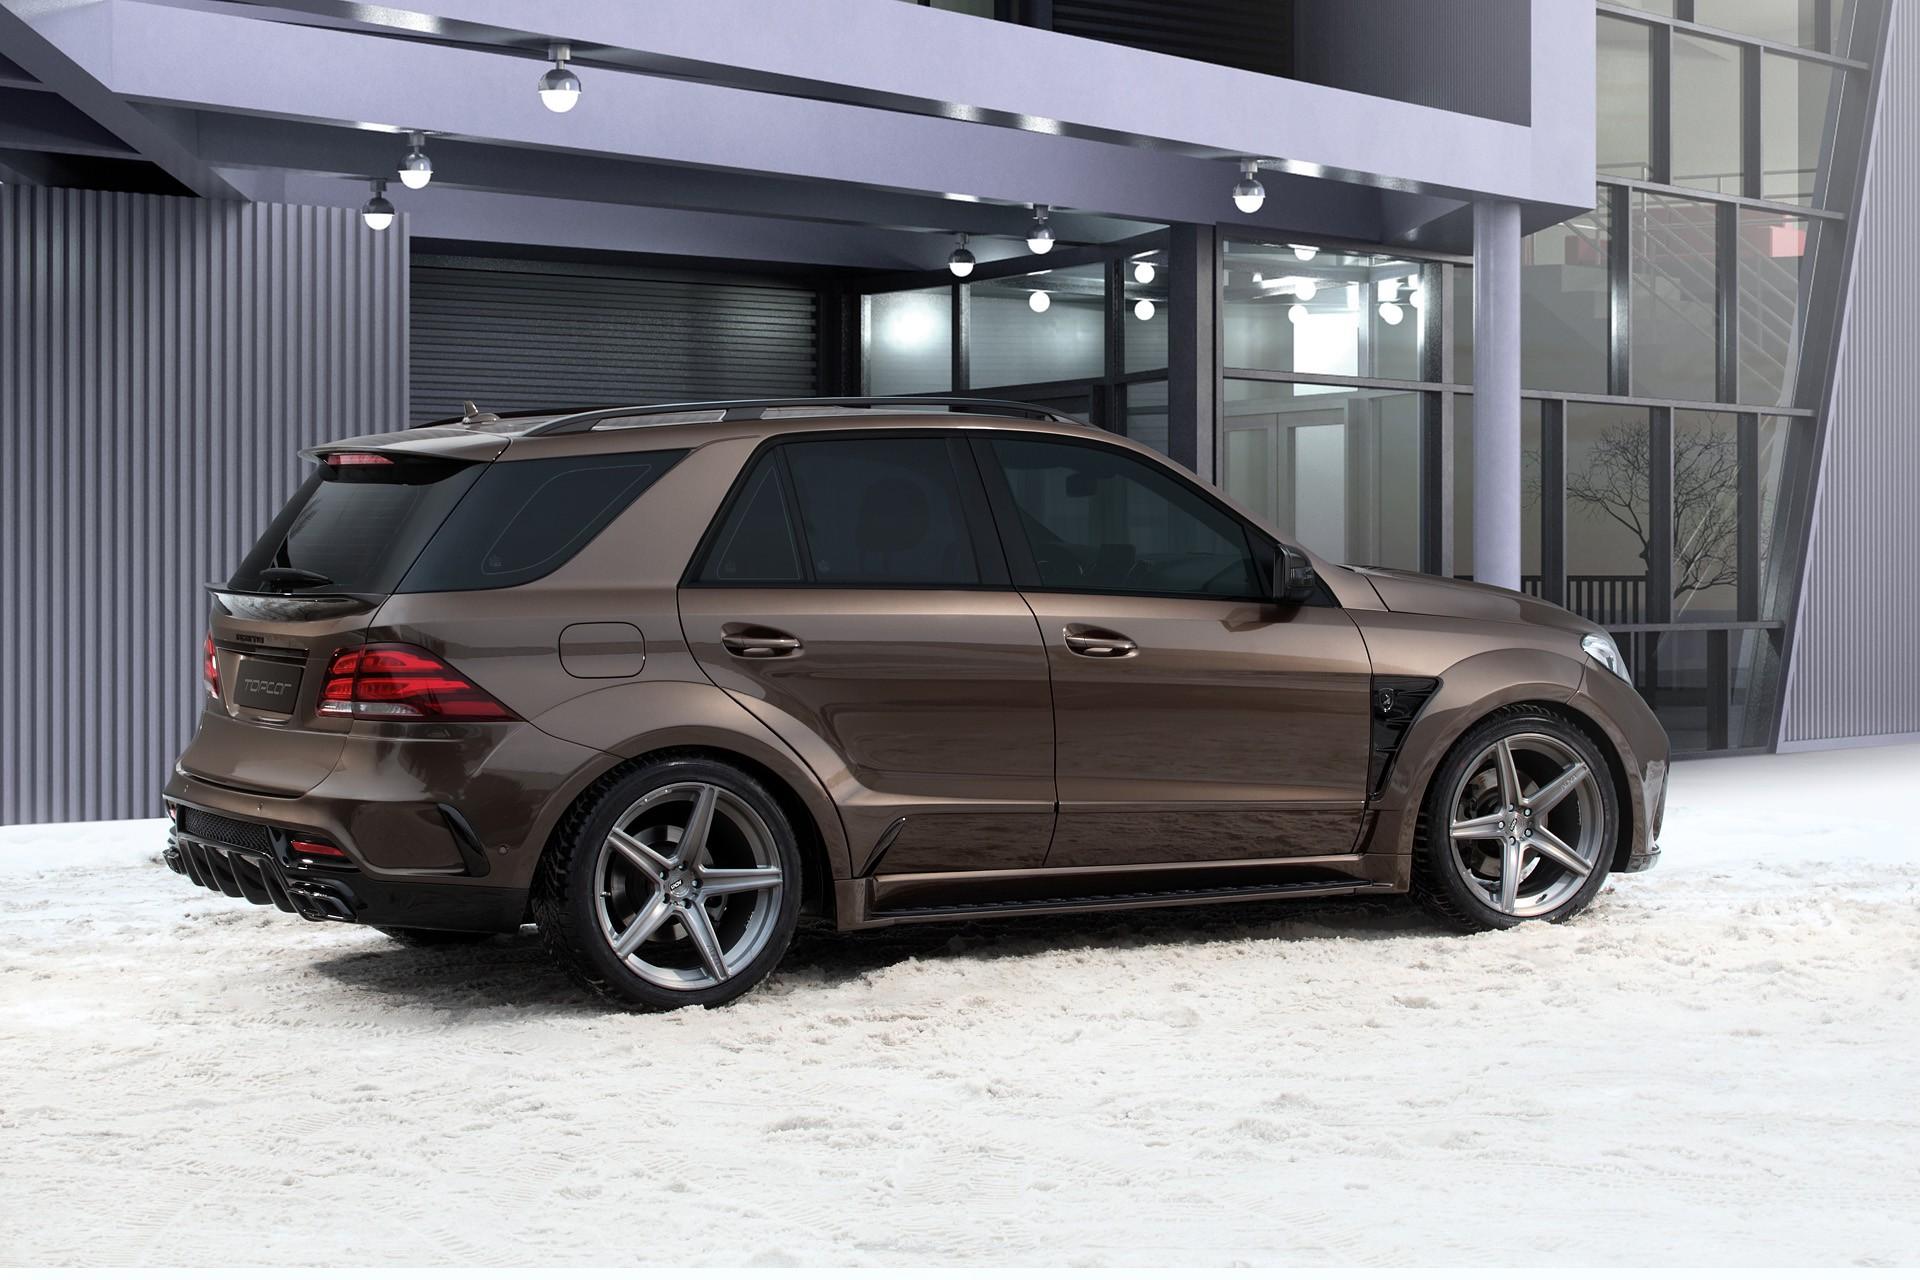 Mercedes Benz Gle Wagon Inferno Brown Topcar